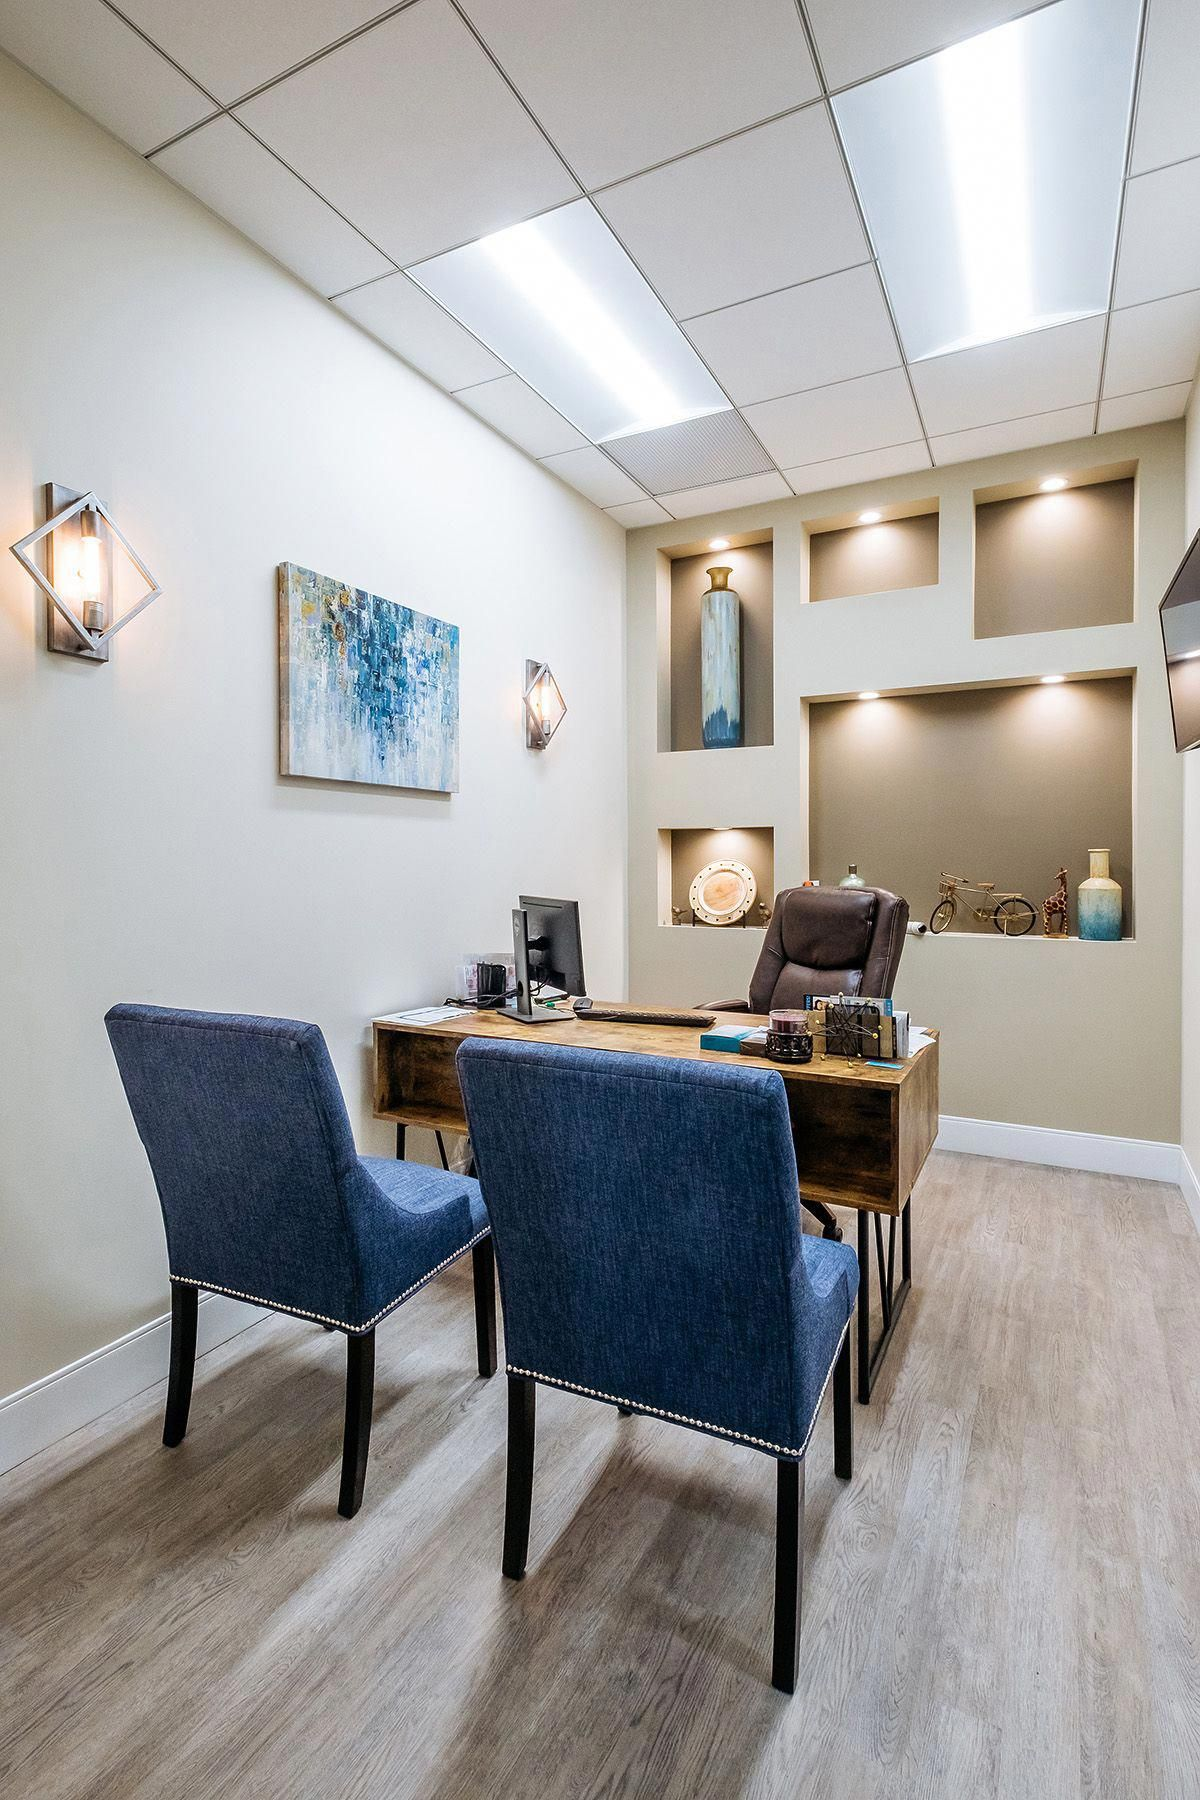 On interior design career by home decoration for anniversary diyhomedecoronabudget also rh pinterest